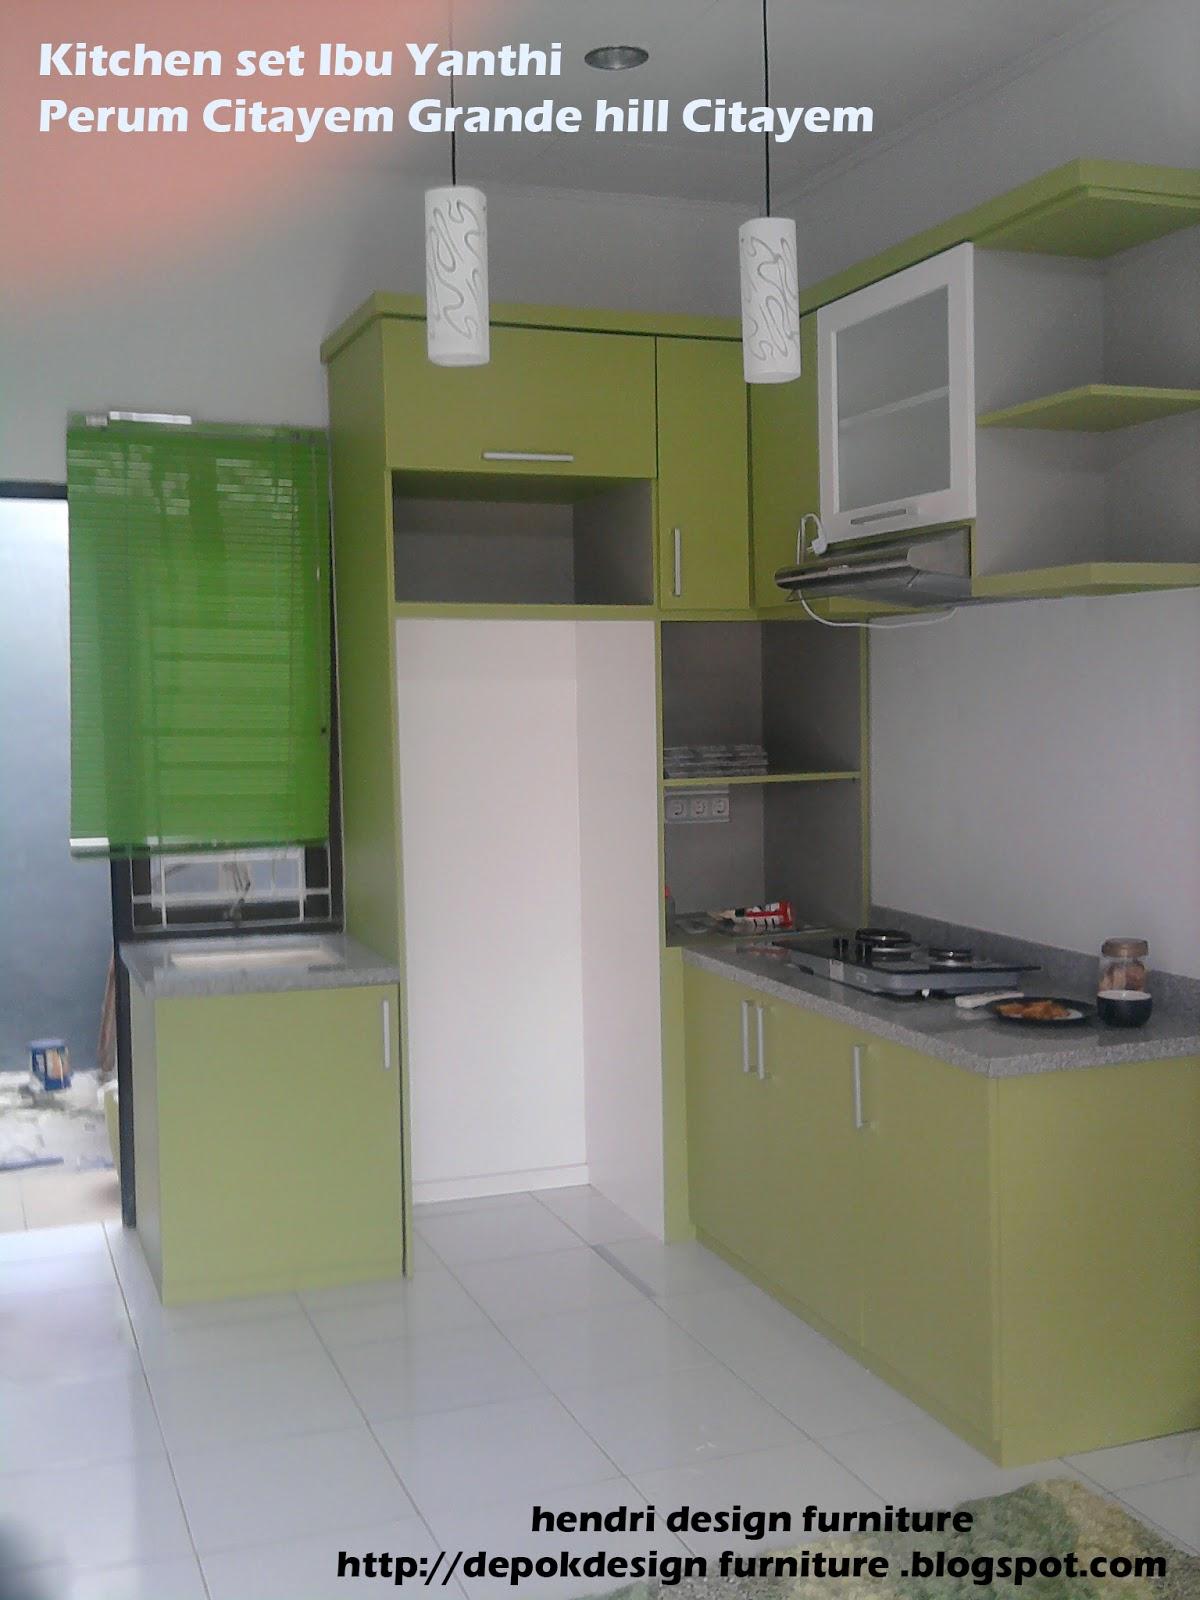 Depok Design Furniture Galarie Hendri Design Kitchen Set